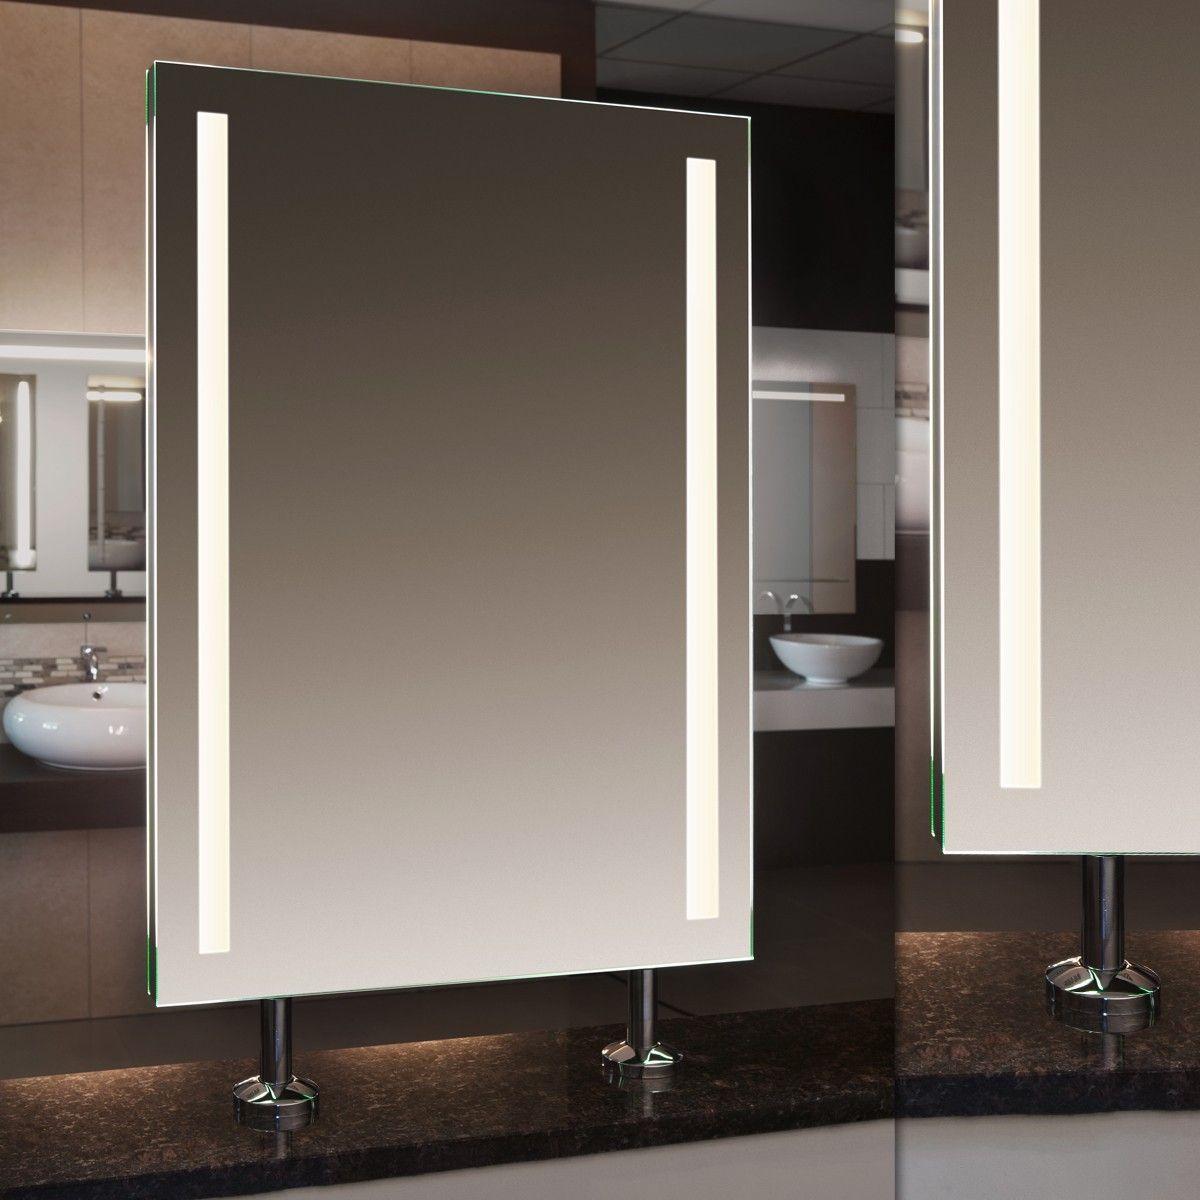 Spiegel Raumteiler Badspiegel Wandspiegel Badezimmerspiegel Leuchtspiegel Badezimmerspiegel Badspiegel Wandspiegel